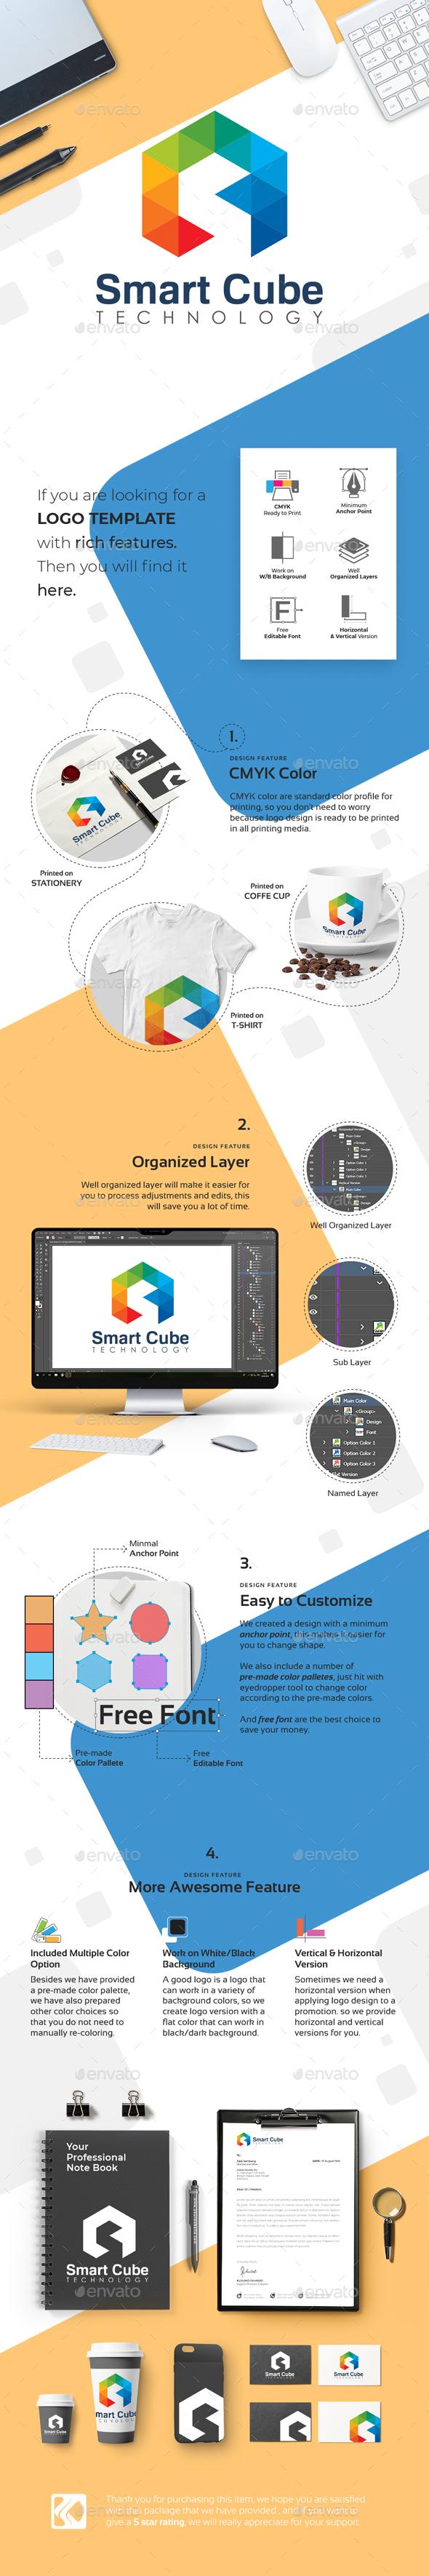 Digital Logo Template - Smart Cube